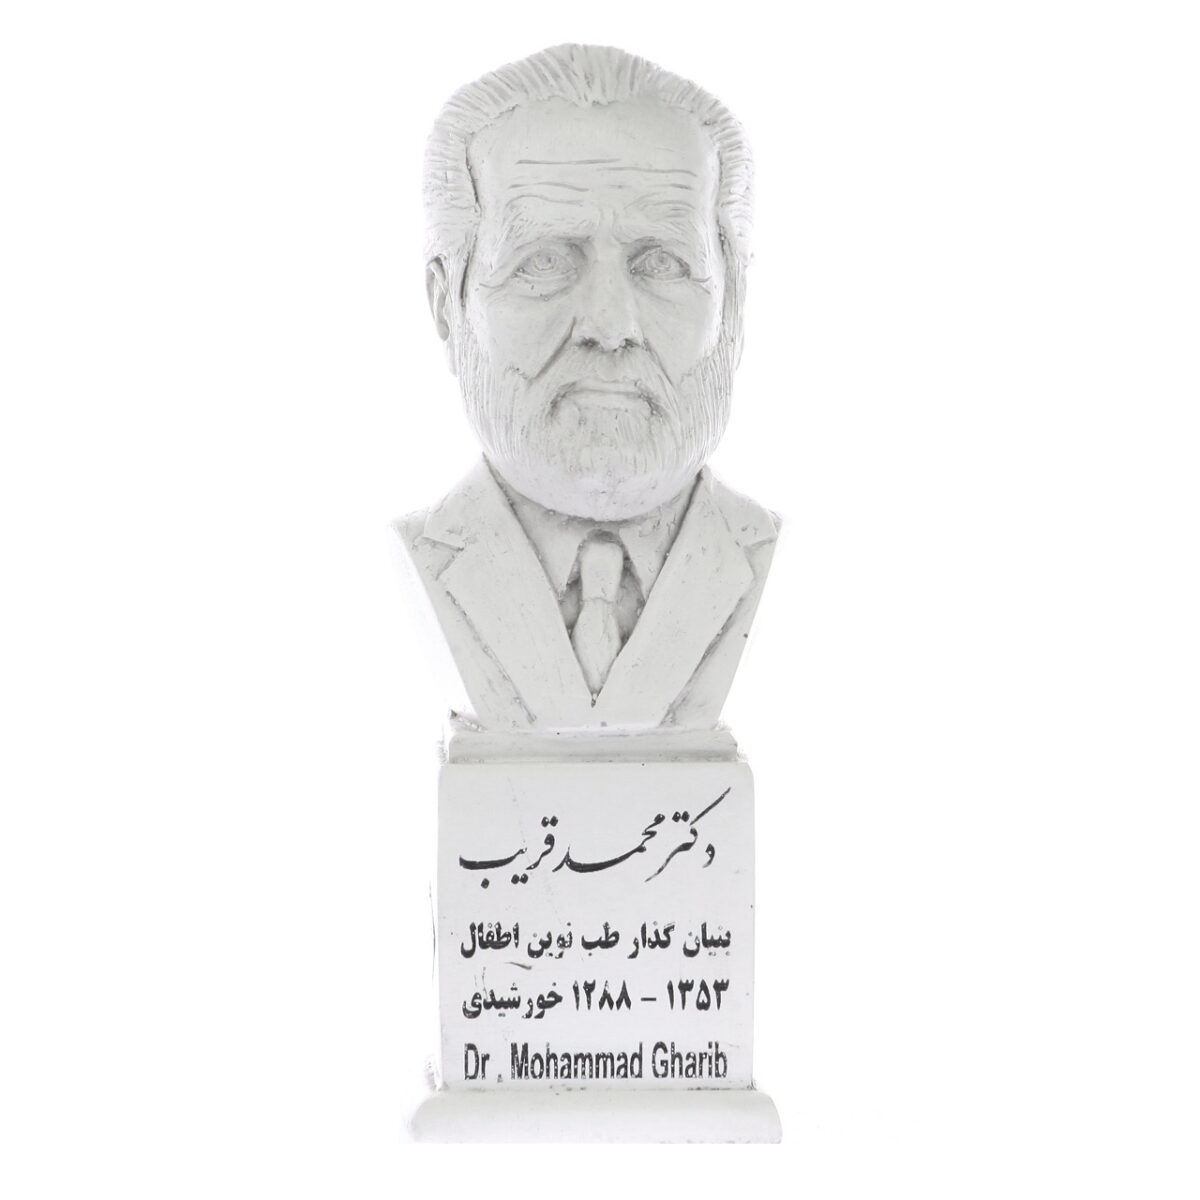 dr mohammad gharib s 1200x1200 - سردیس دکتر محمد قریب